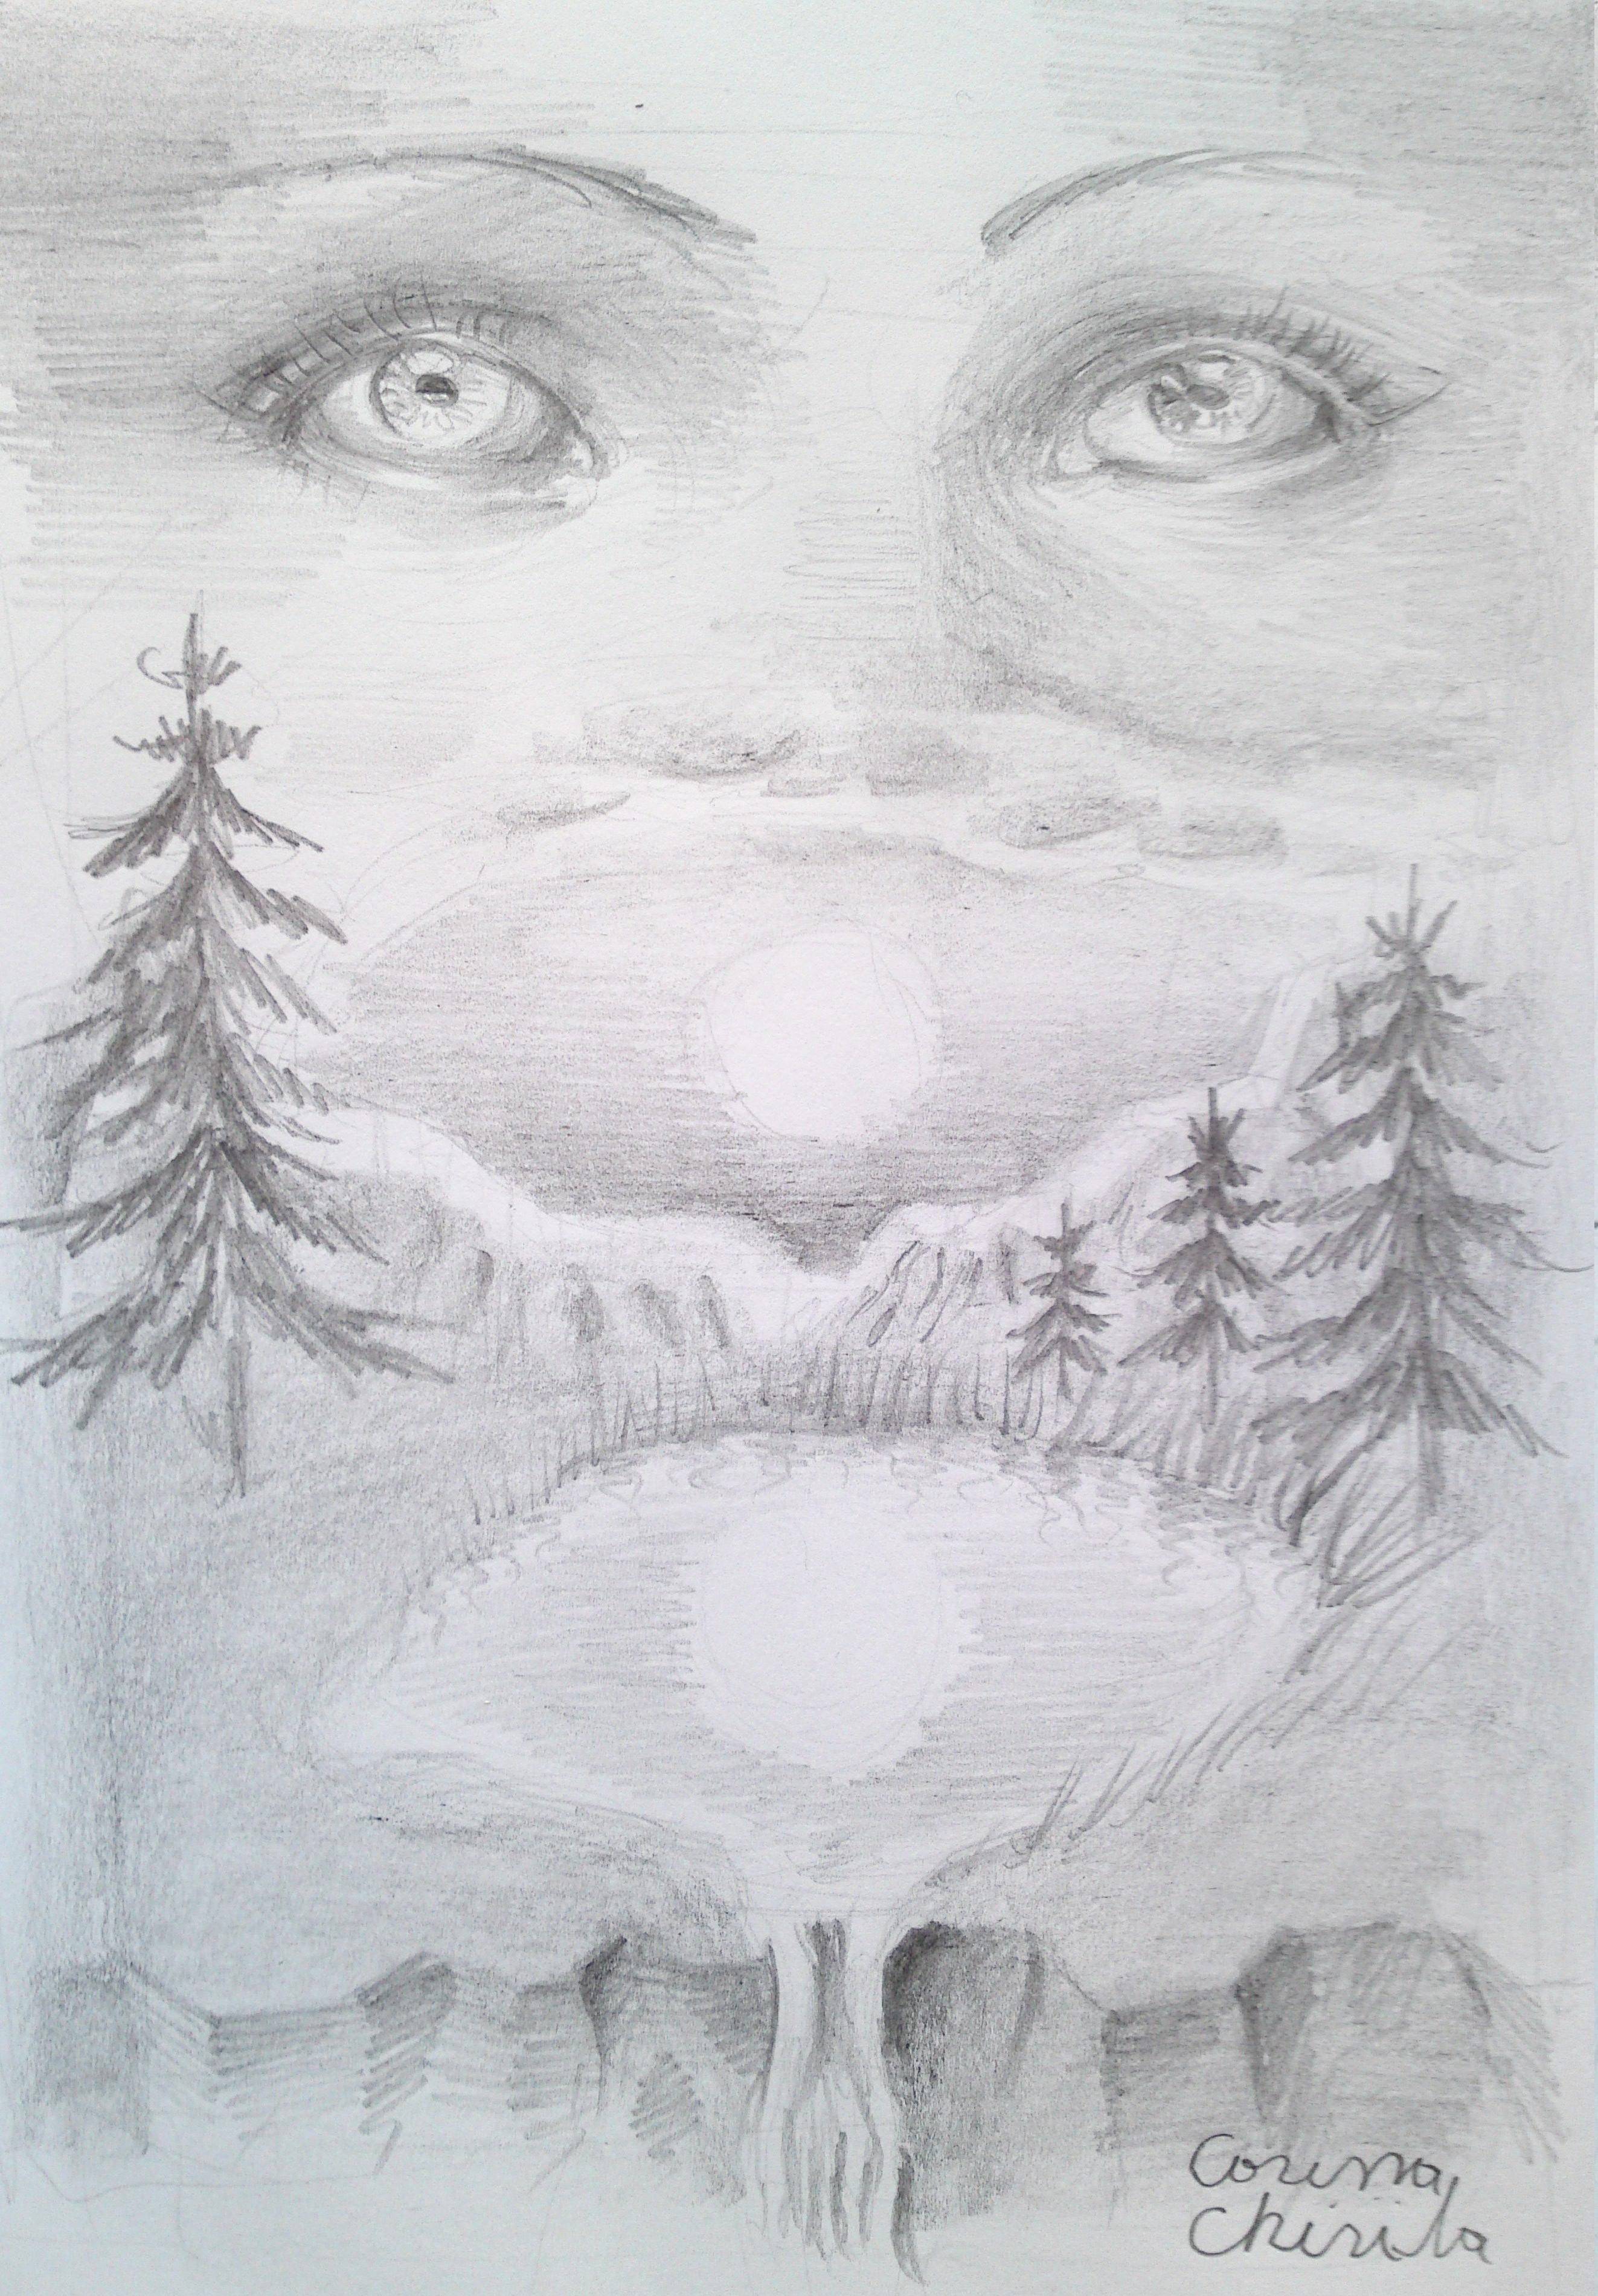 Desen Creion Inspirat Poezia Lucian Blaga Amintire Imagini Peisaje Toamna Acuarela